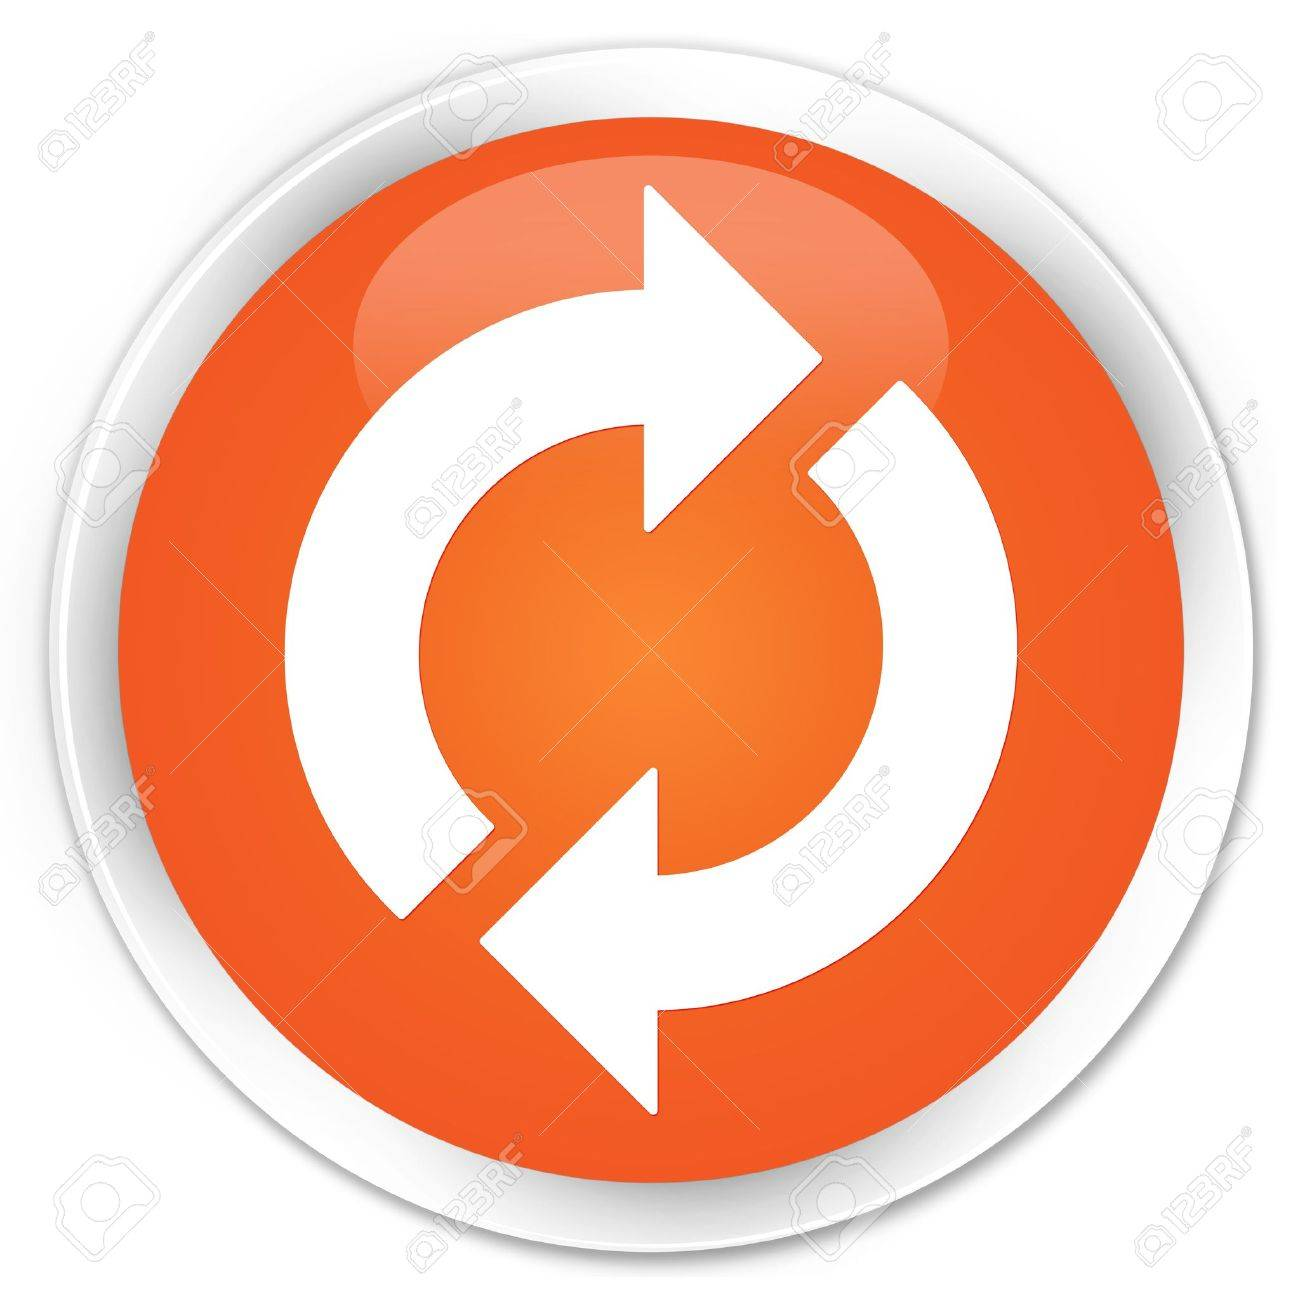 Update icon glossy orange button Stock Photo - 16278993